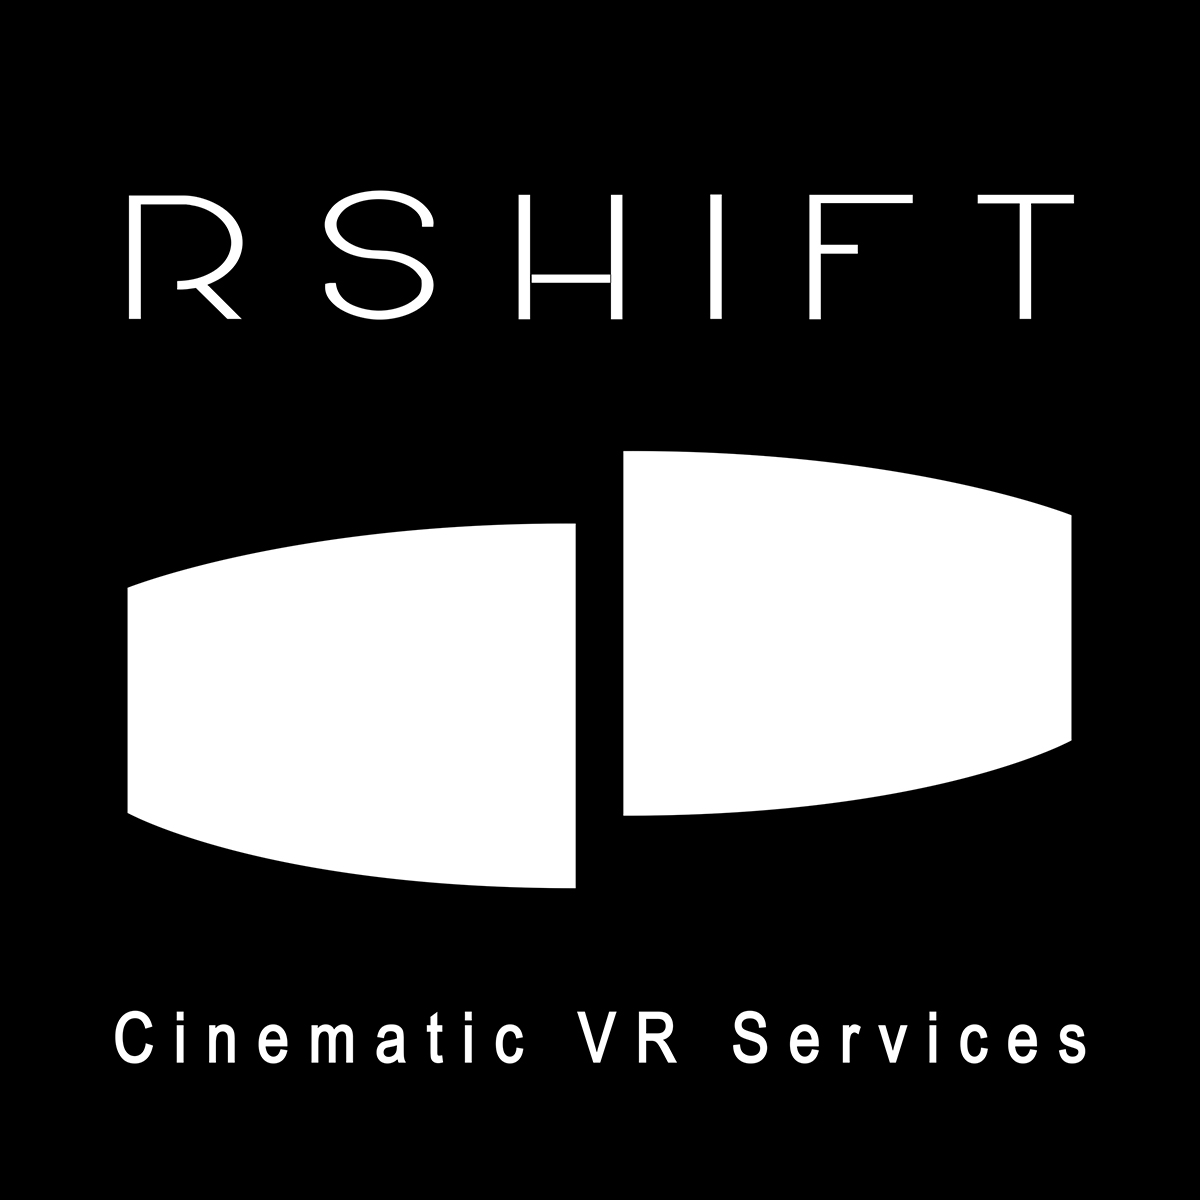 Logo RSHIFT